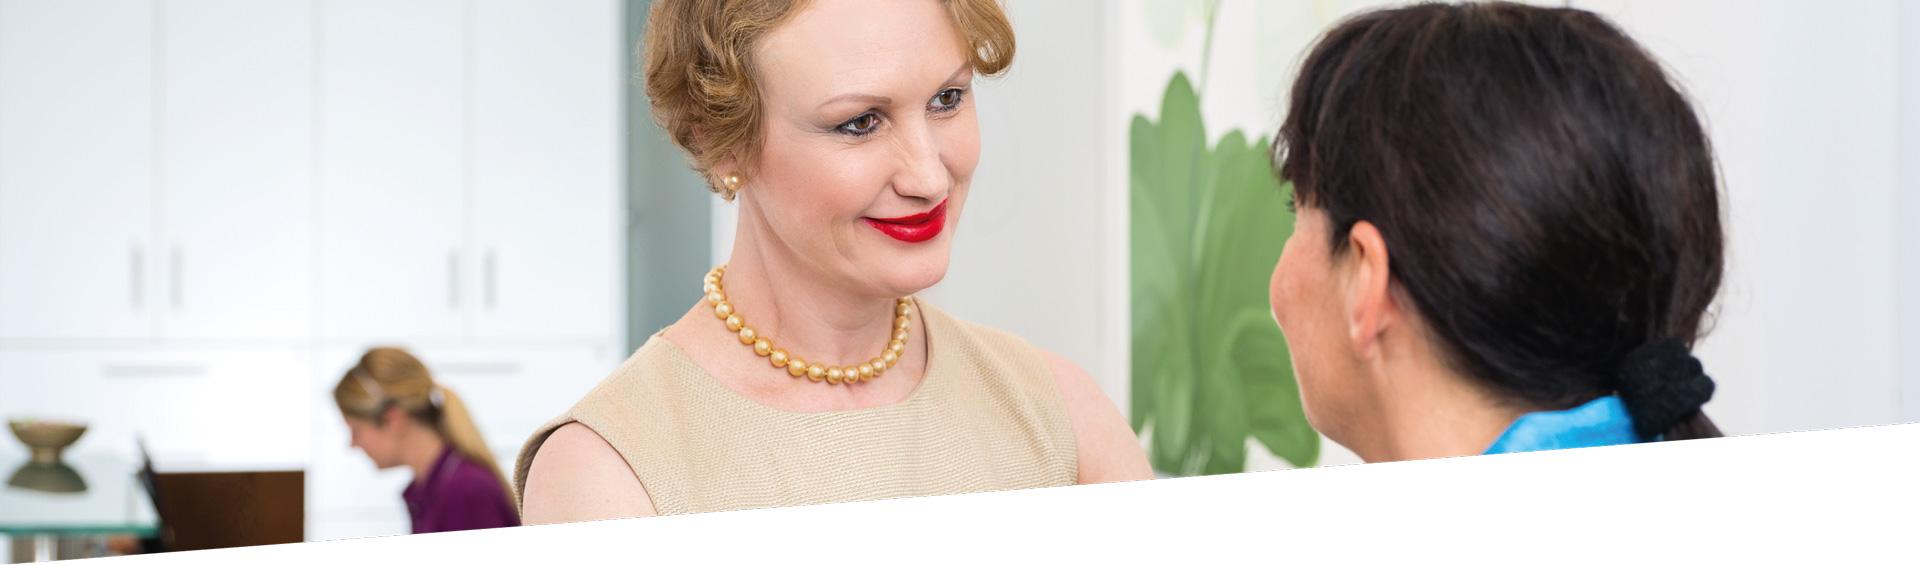 Beratung Plastische Chirurgie München - Dr. med. Dr. med. Christina Günter